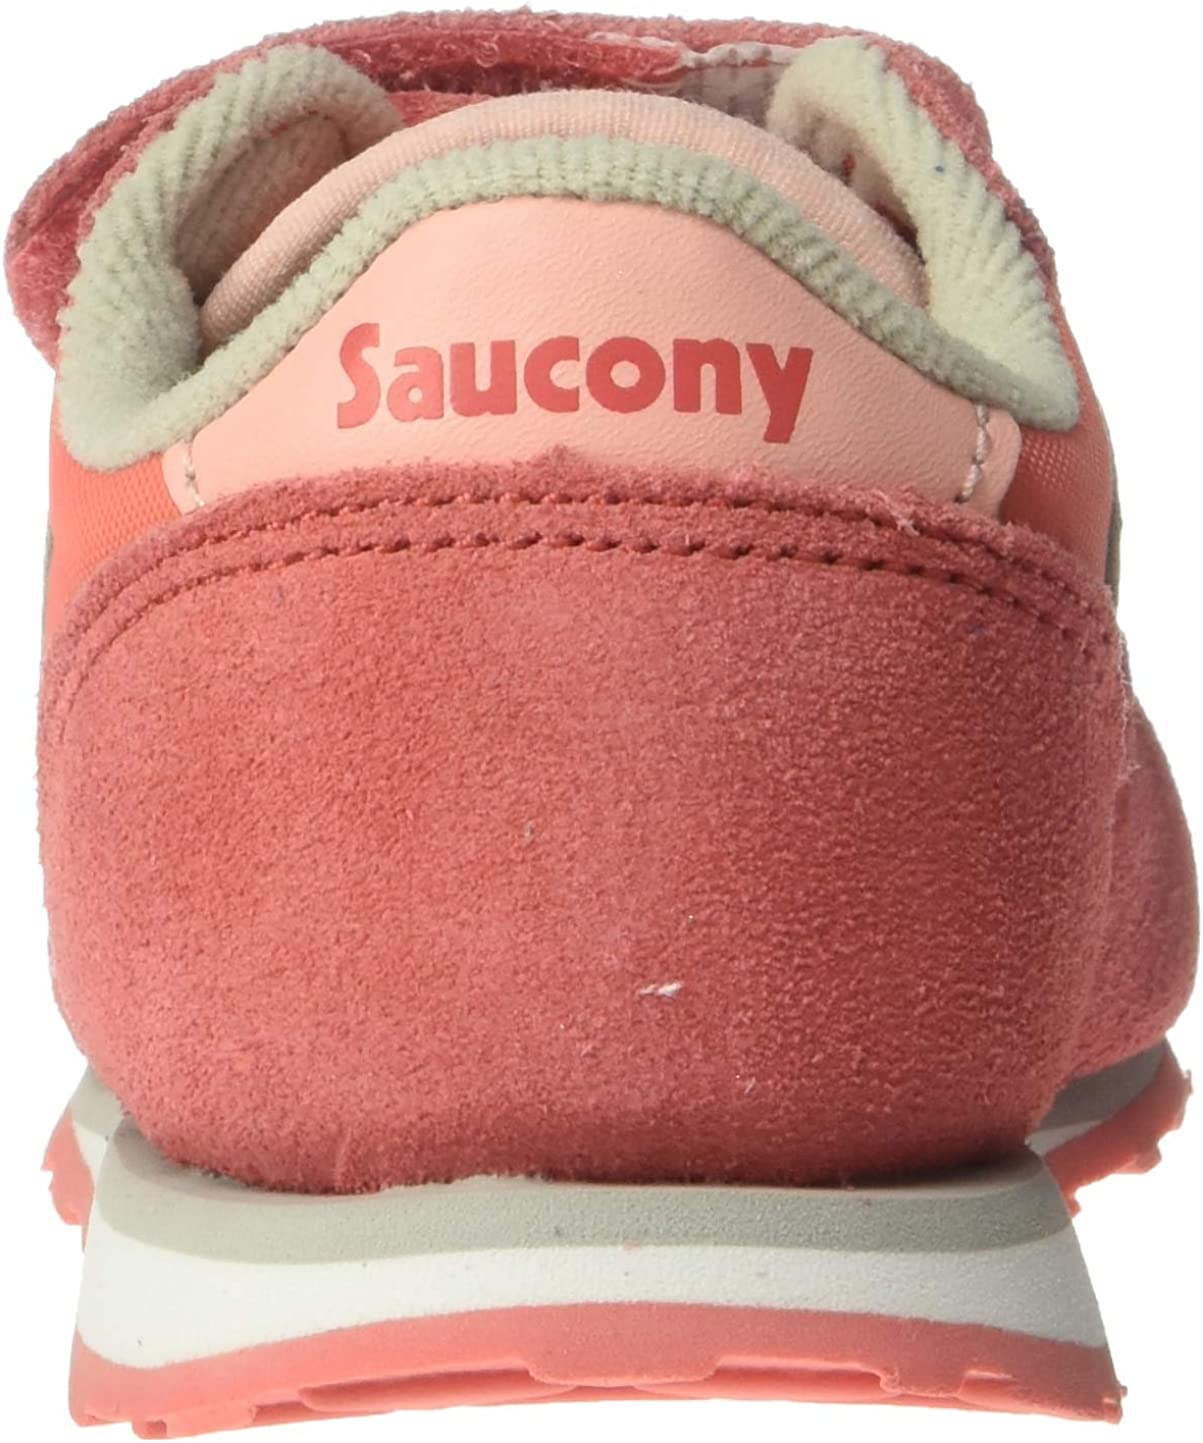 Saucony Baby Jazz HL Bambini Scarpe da Ginnastica Basse Unisex